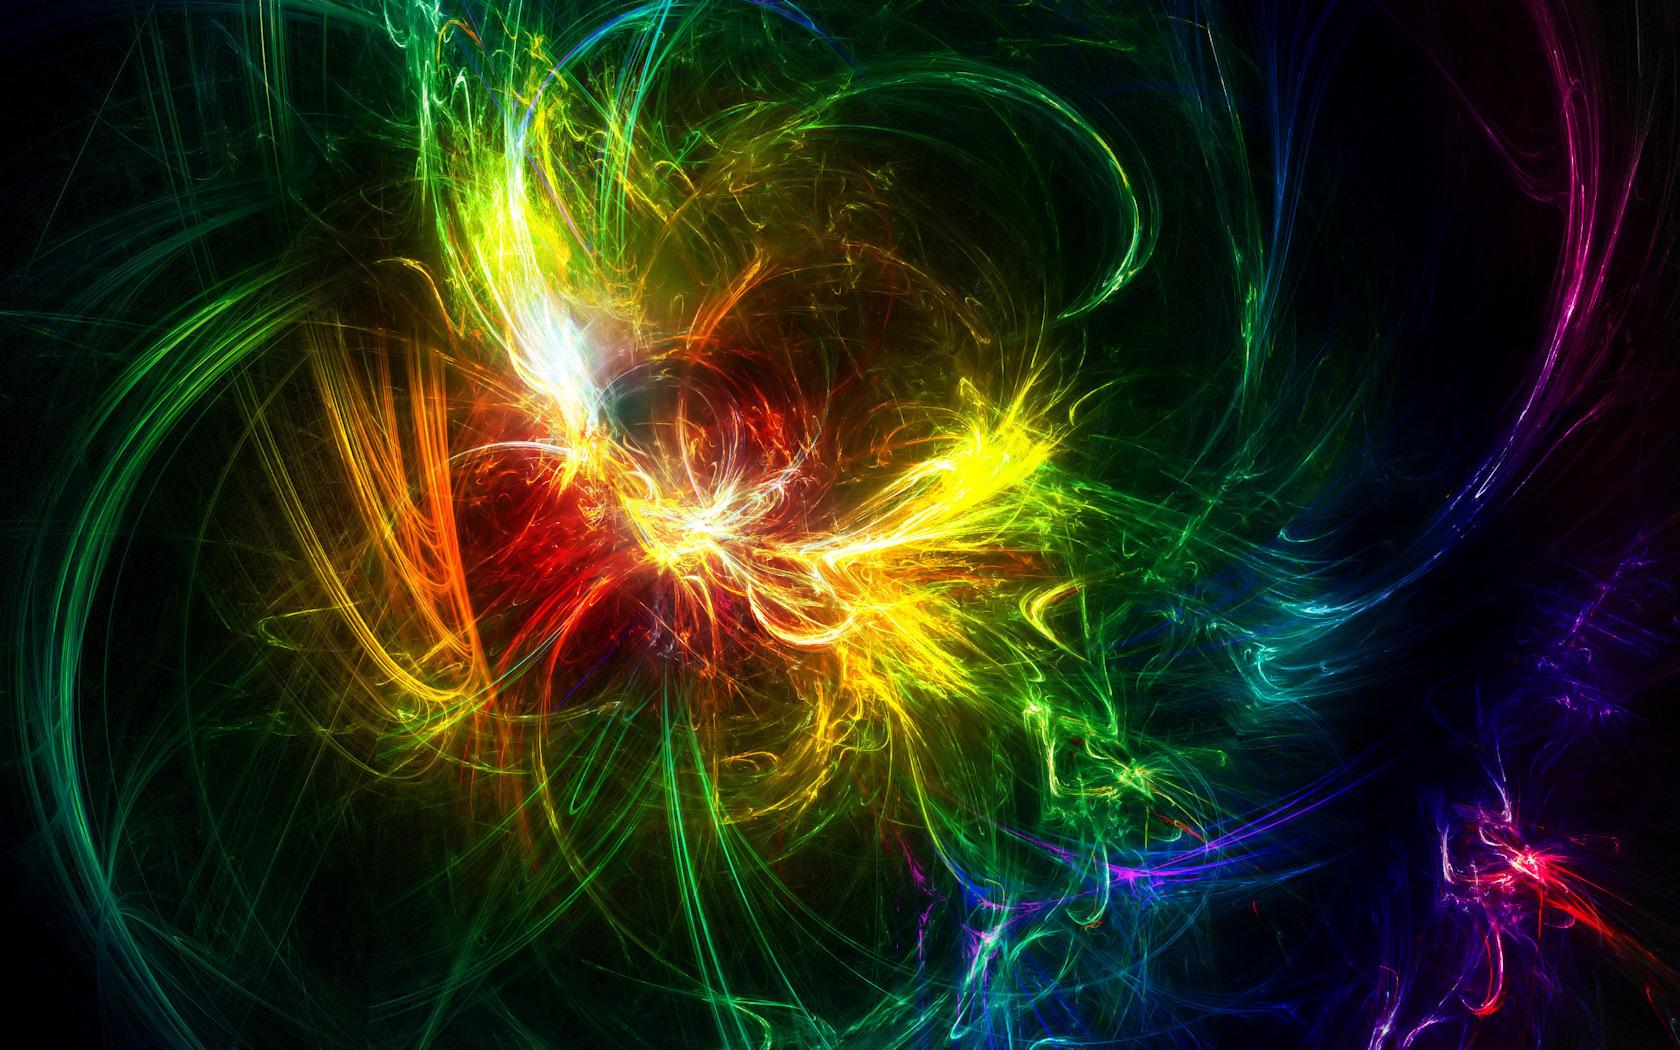 Phoenix Rising by morningstar3878